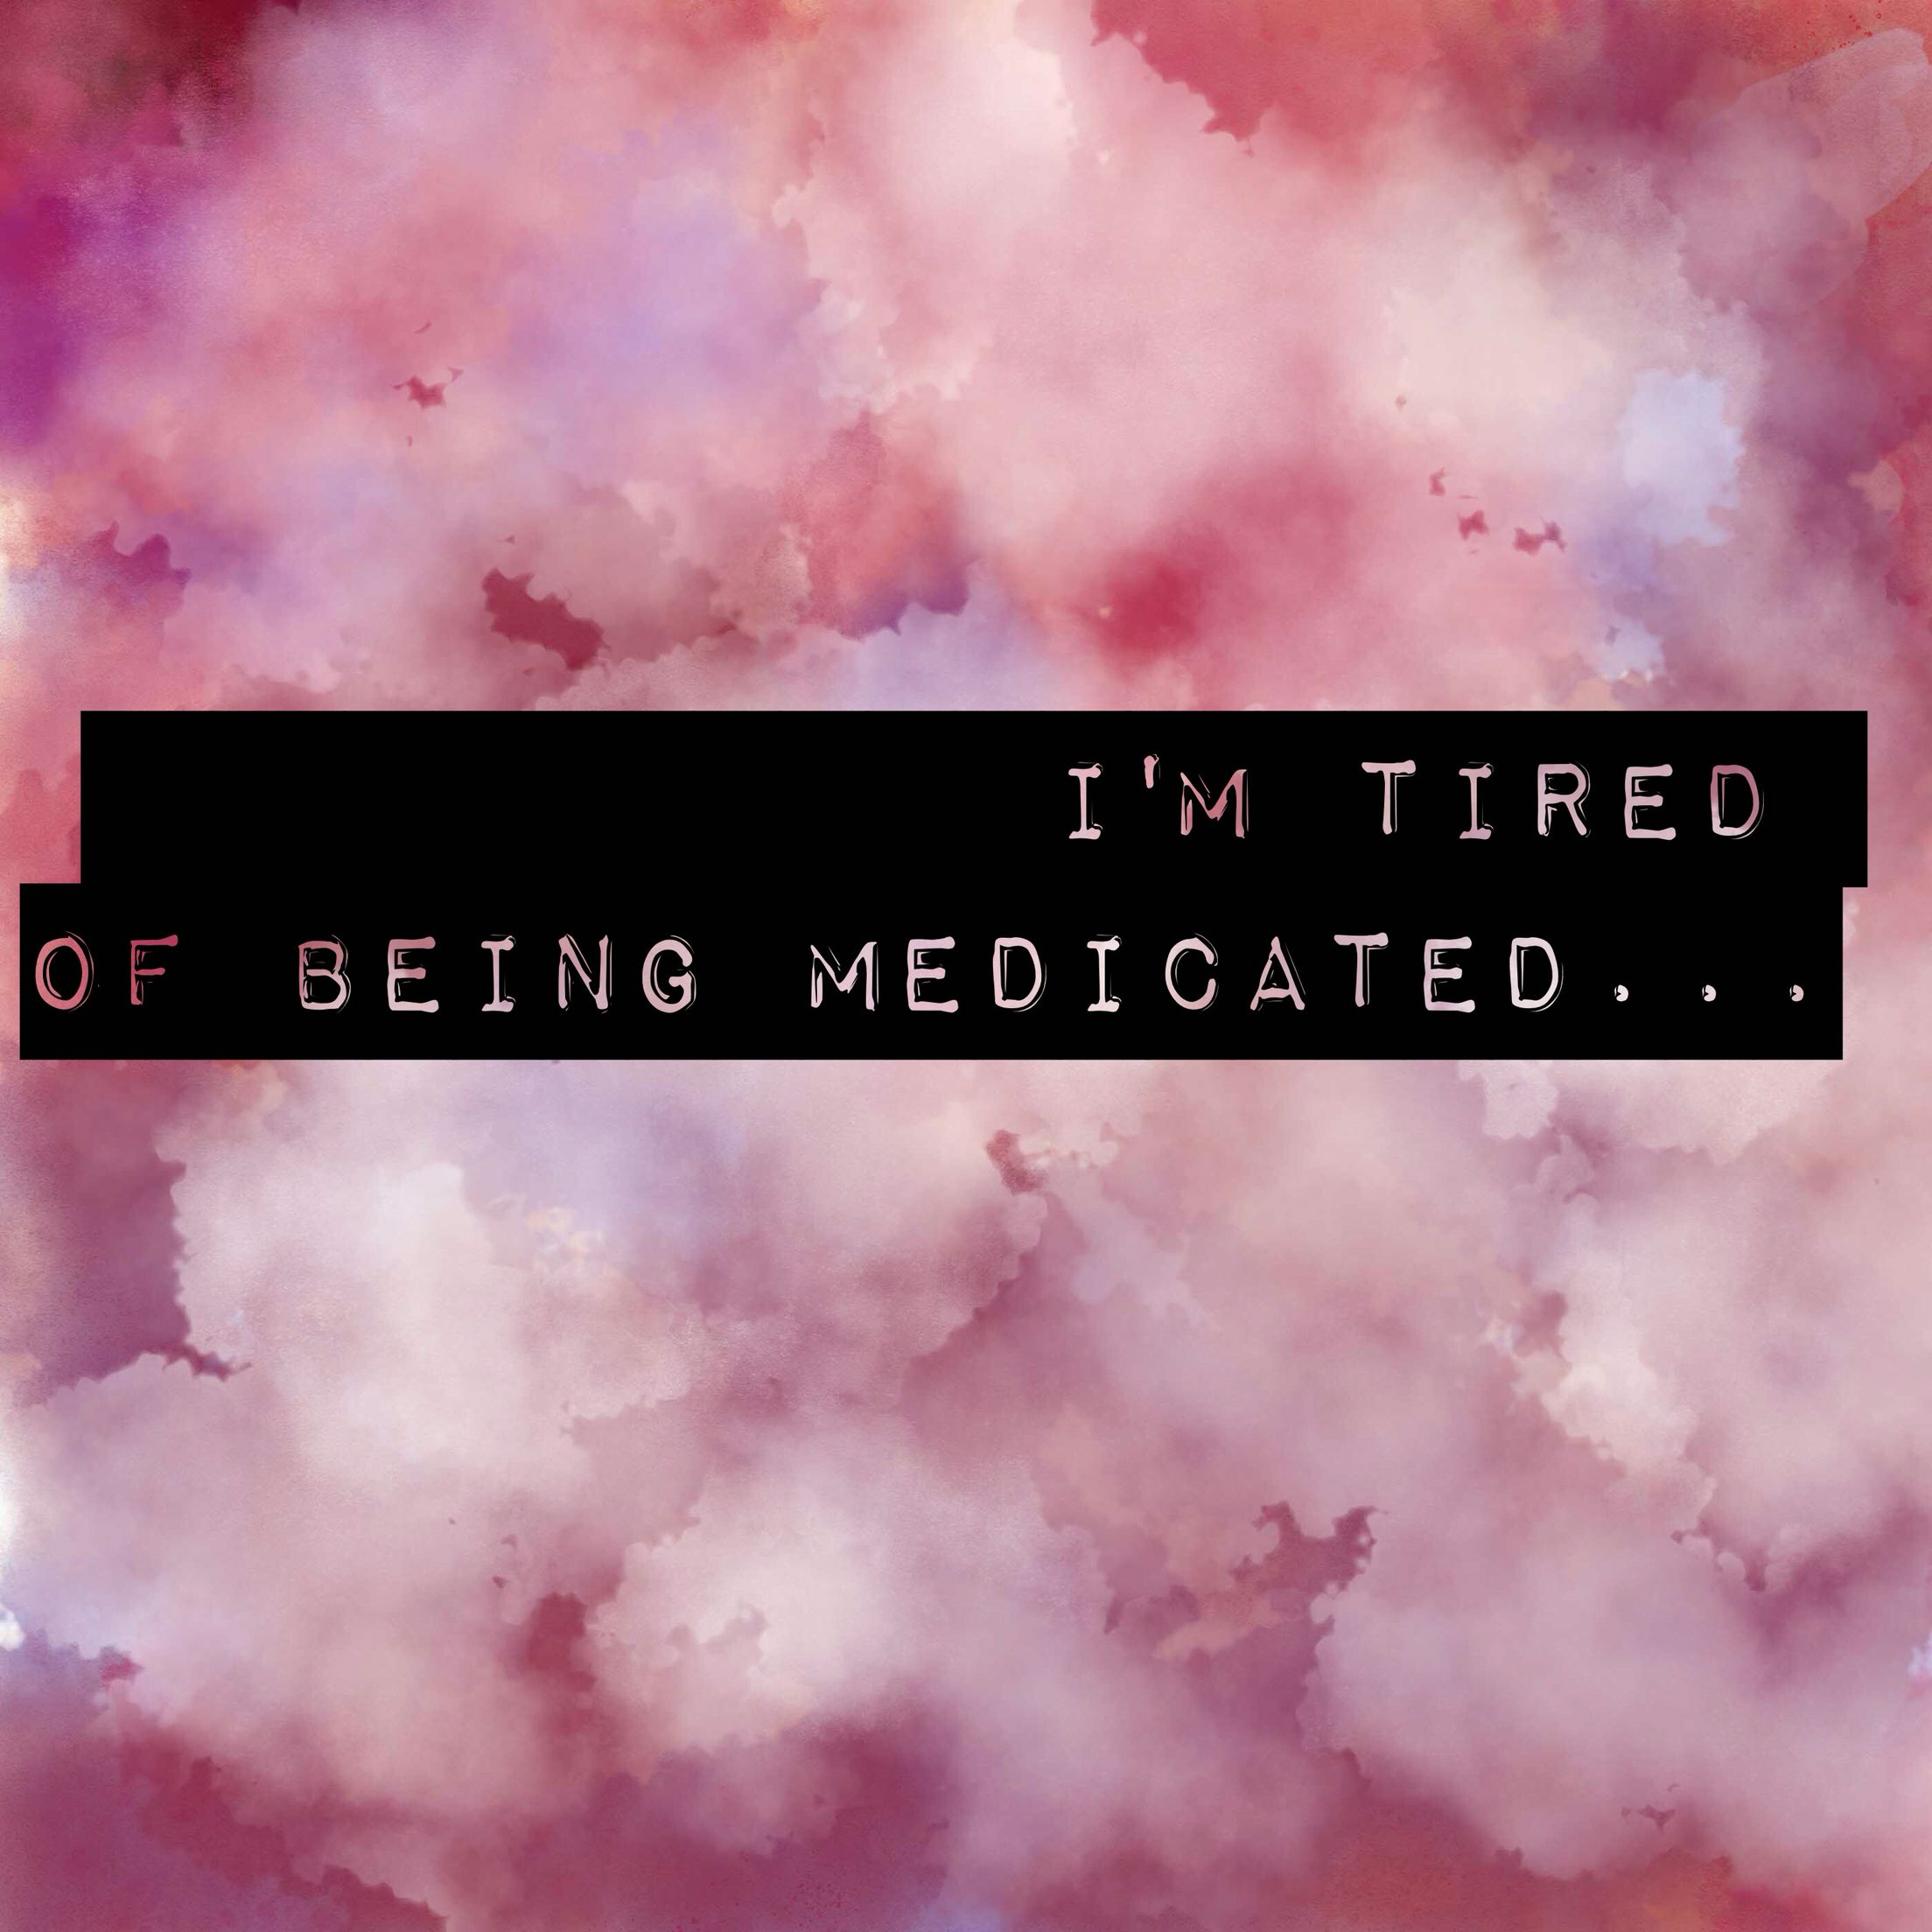 can drug abuse cause mental illness